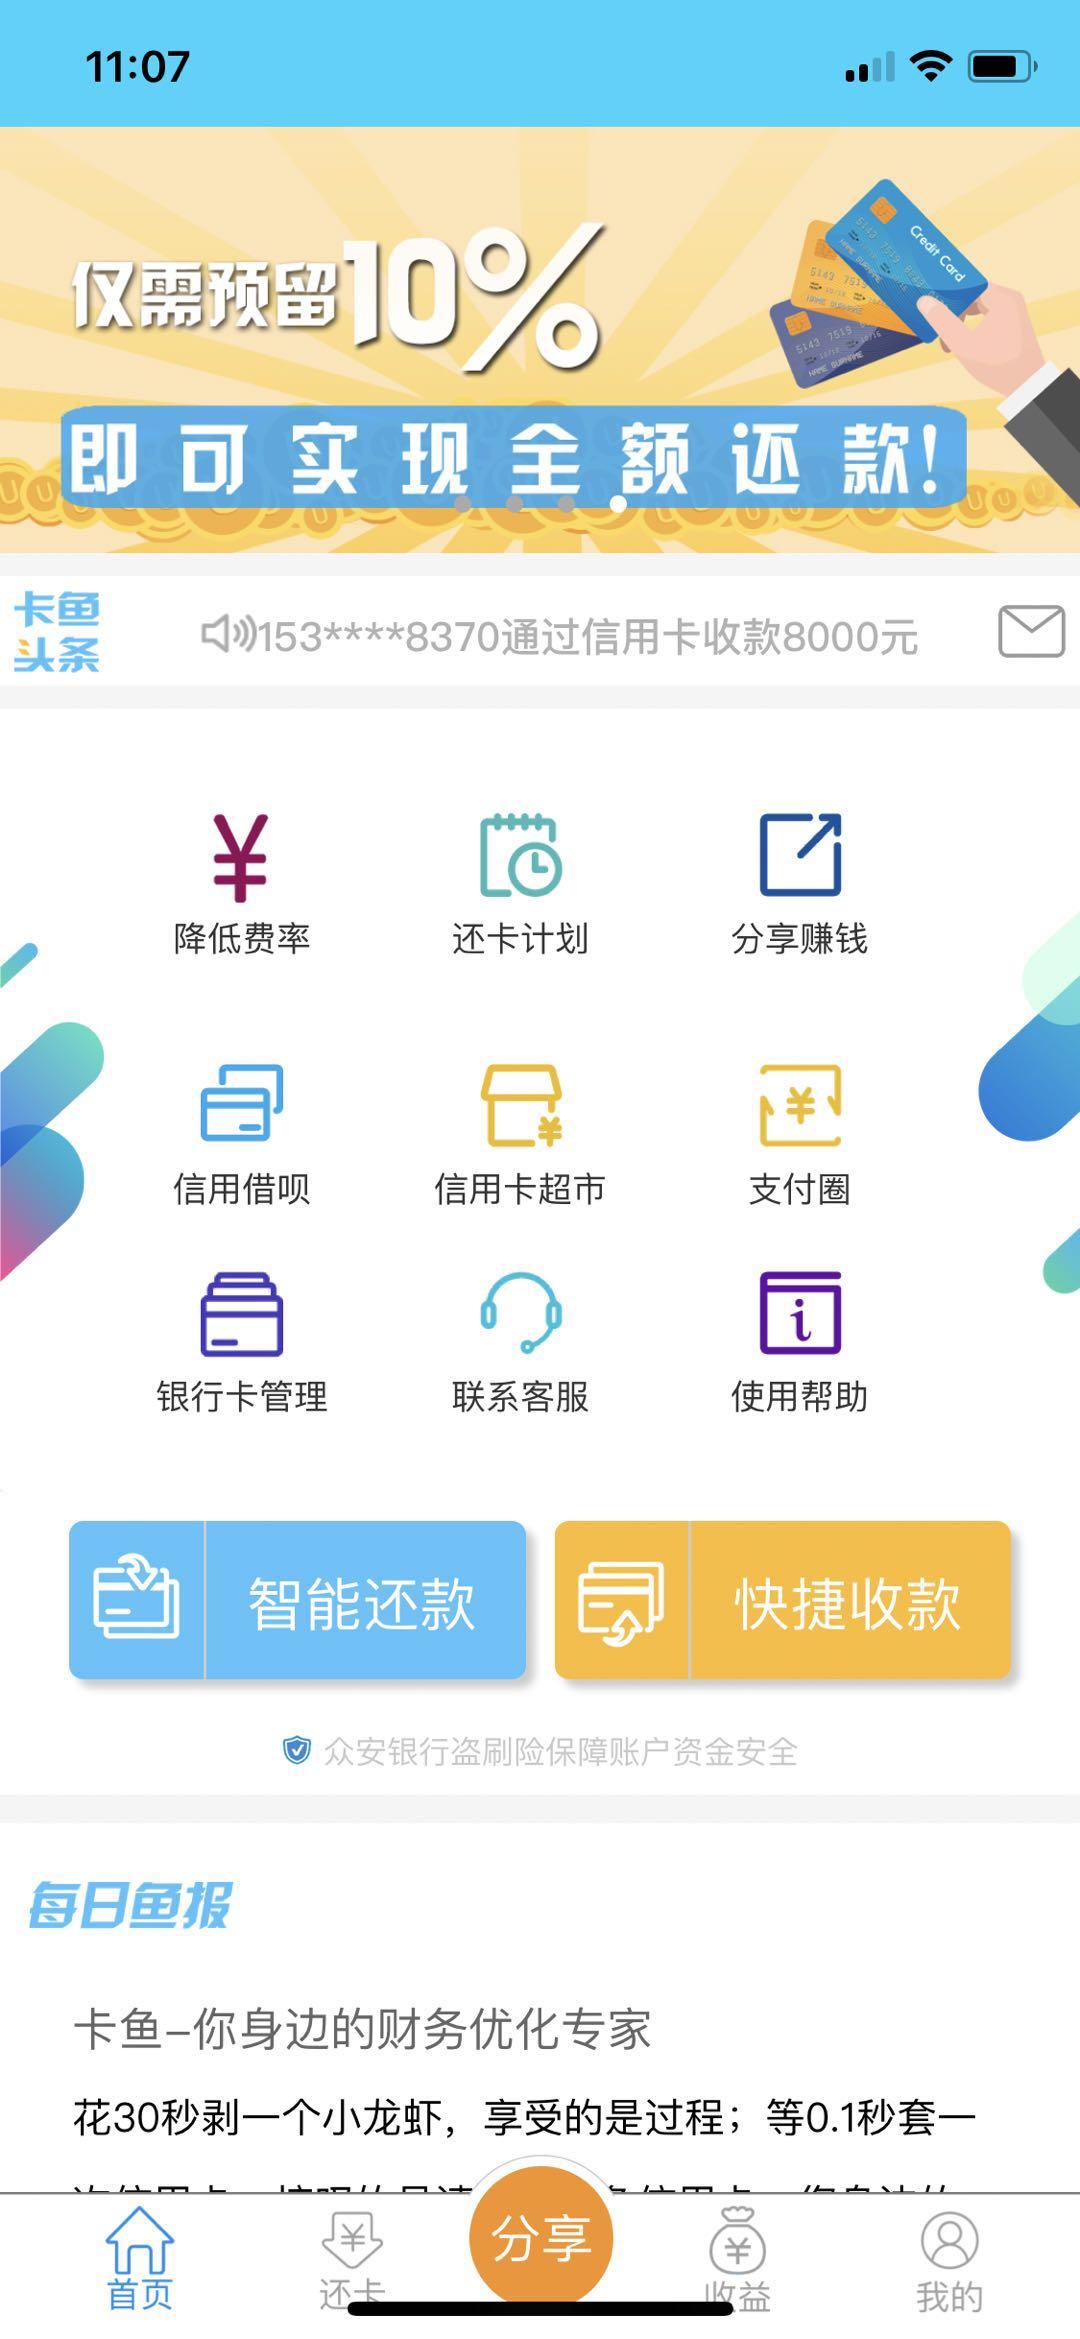 卡鱼app首页